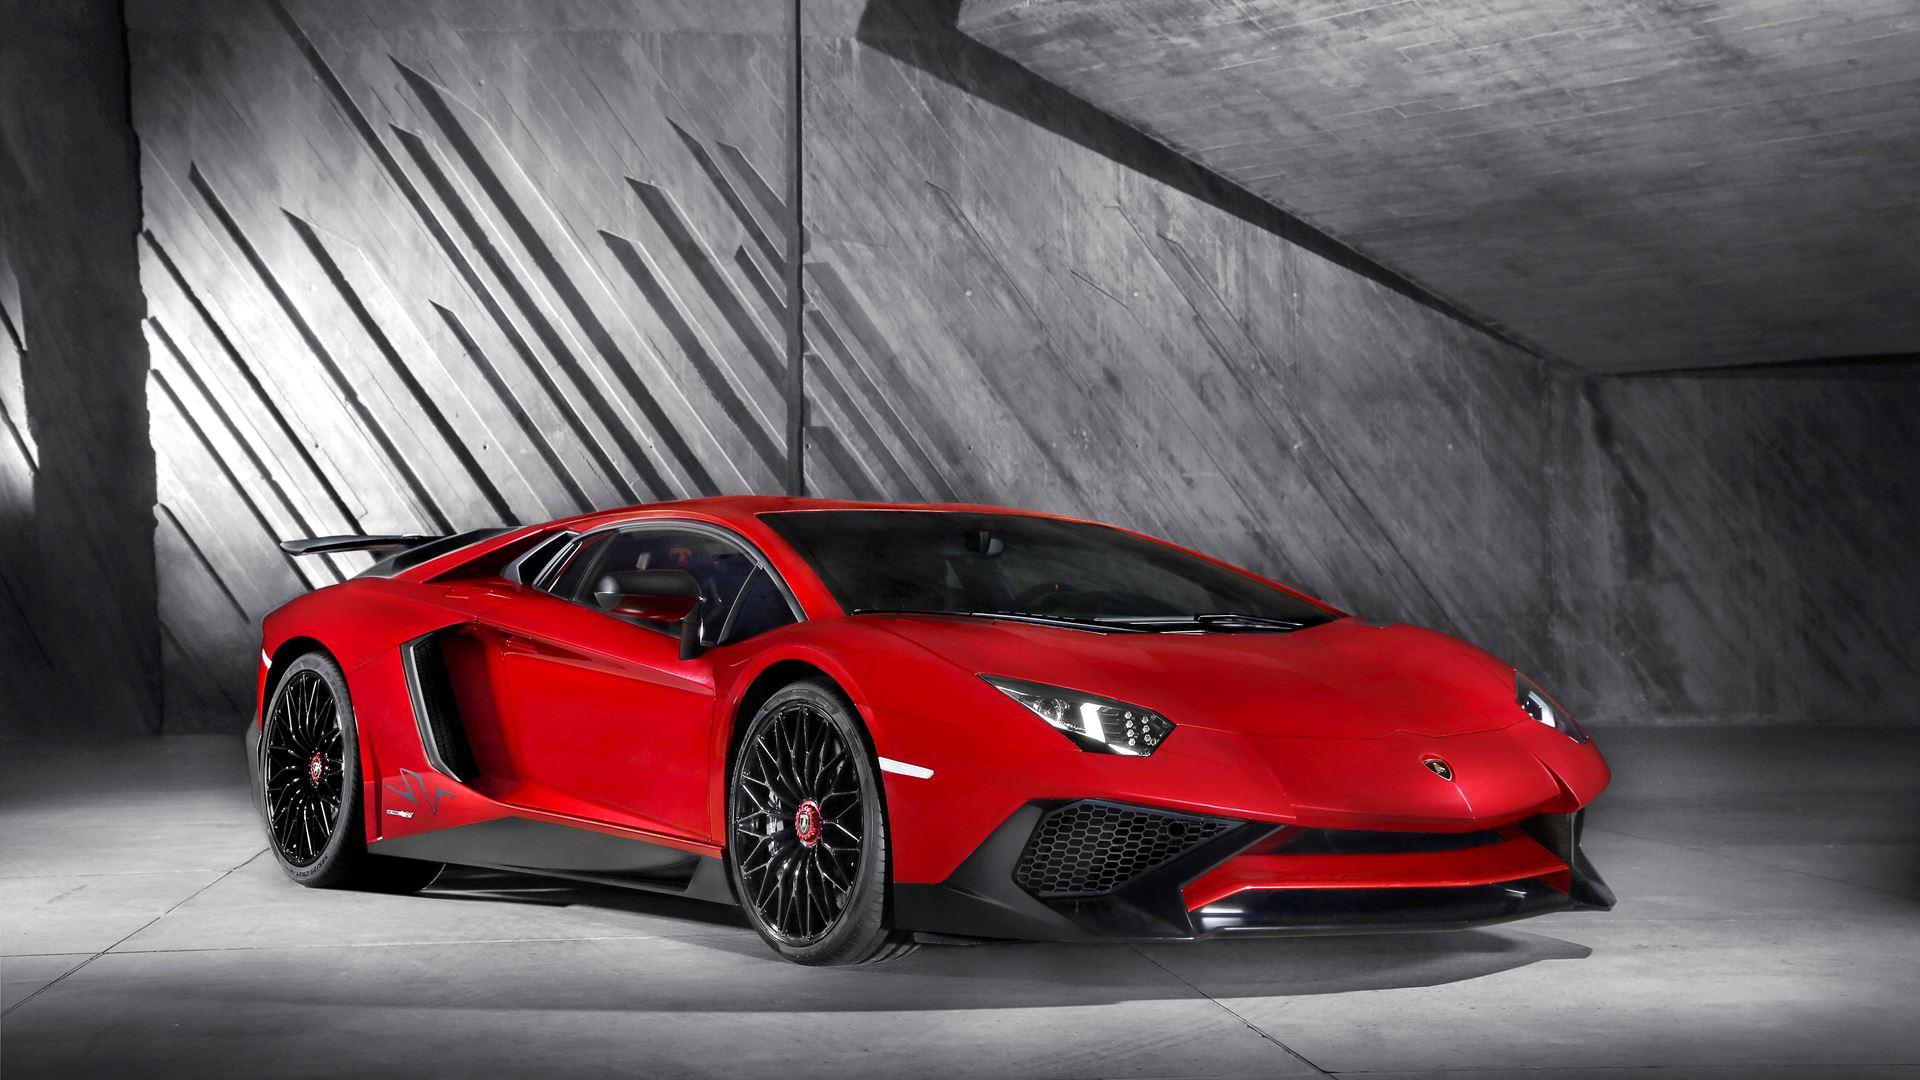 Lamborghini Aventador: 10 innovations in 10 years - Image 2